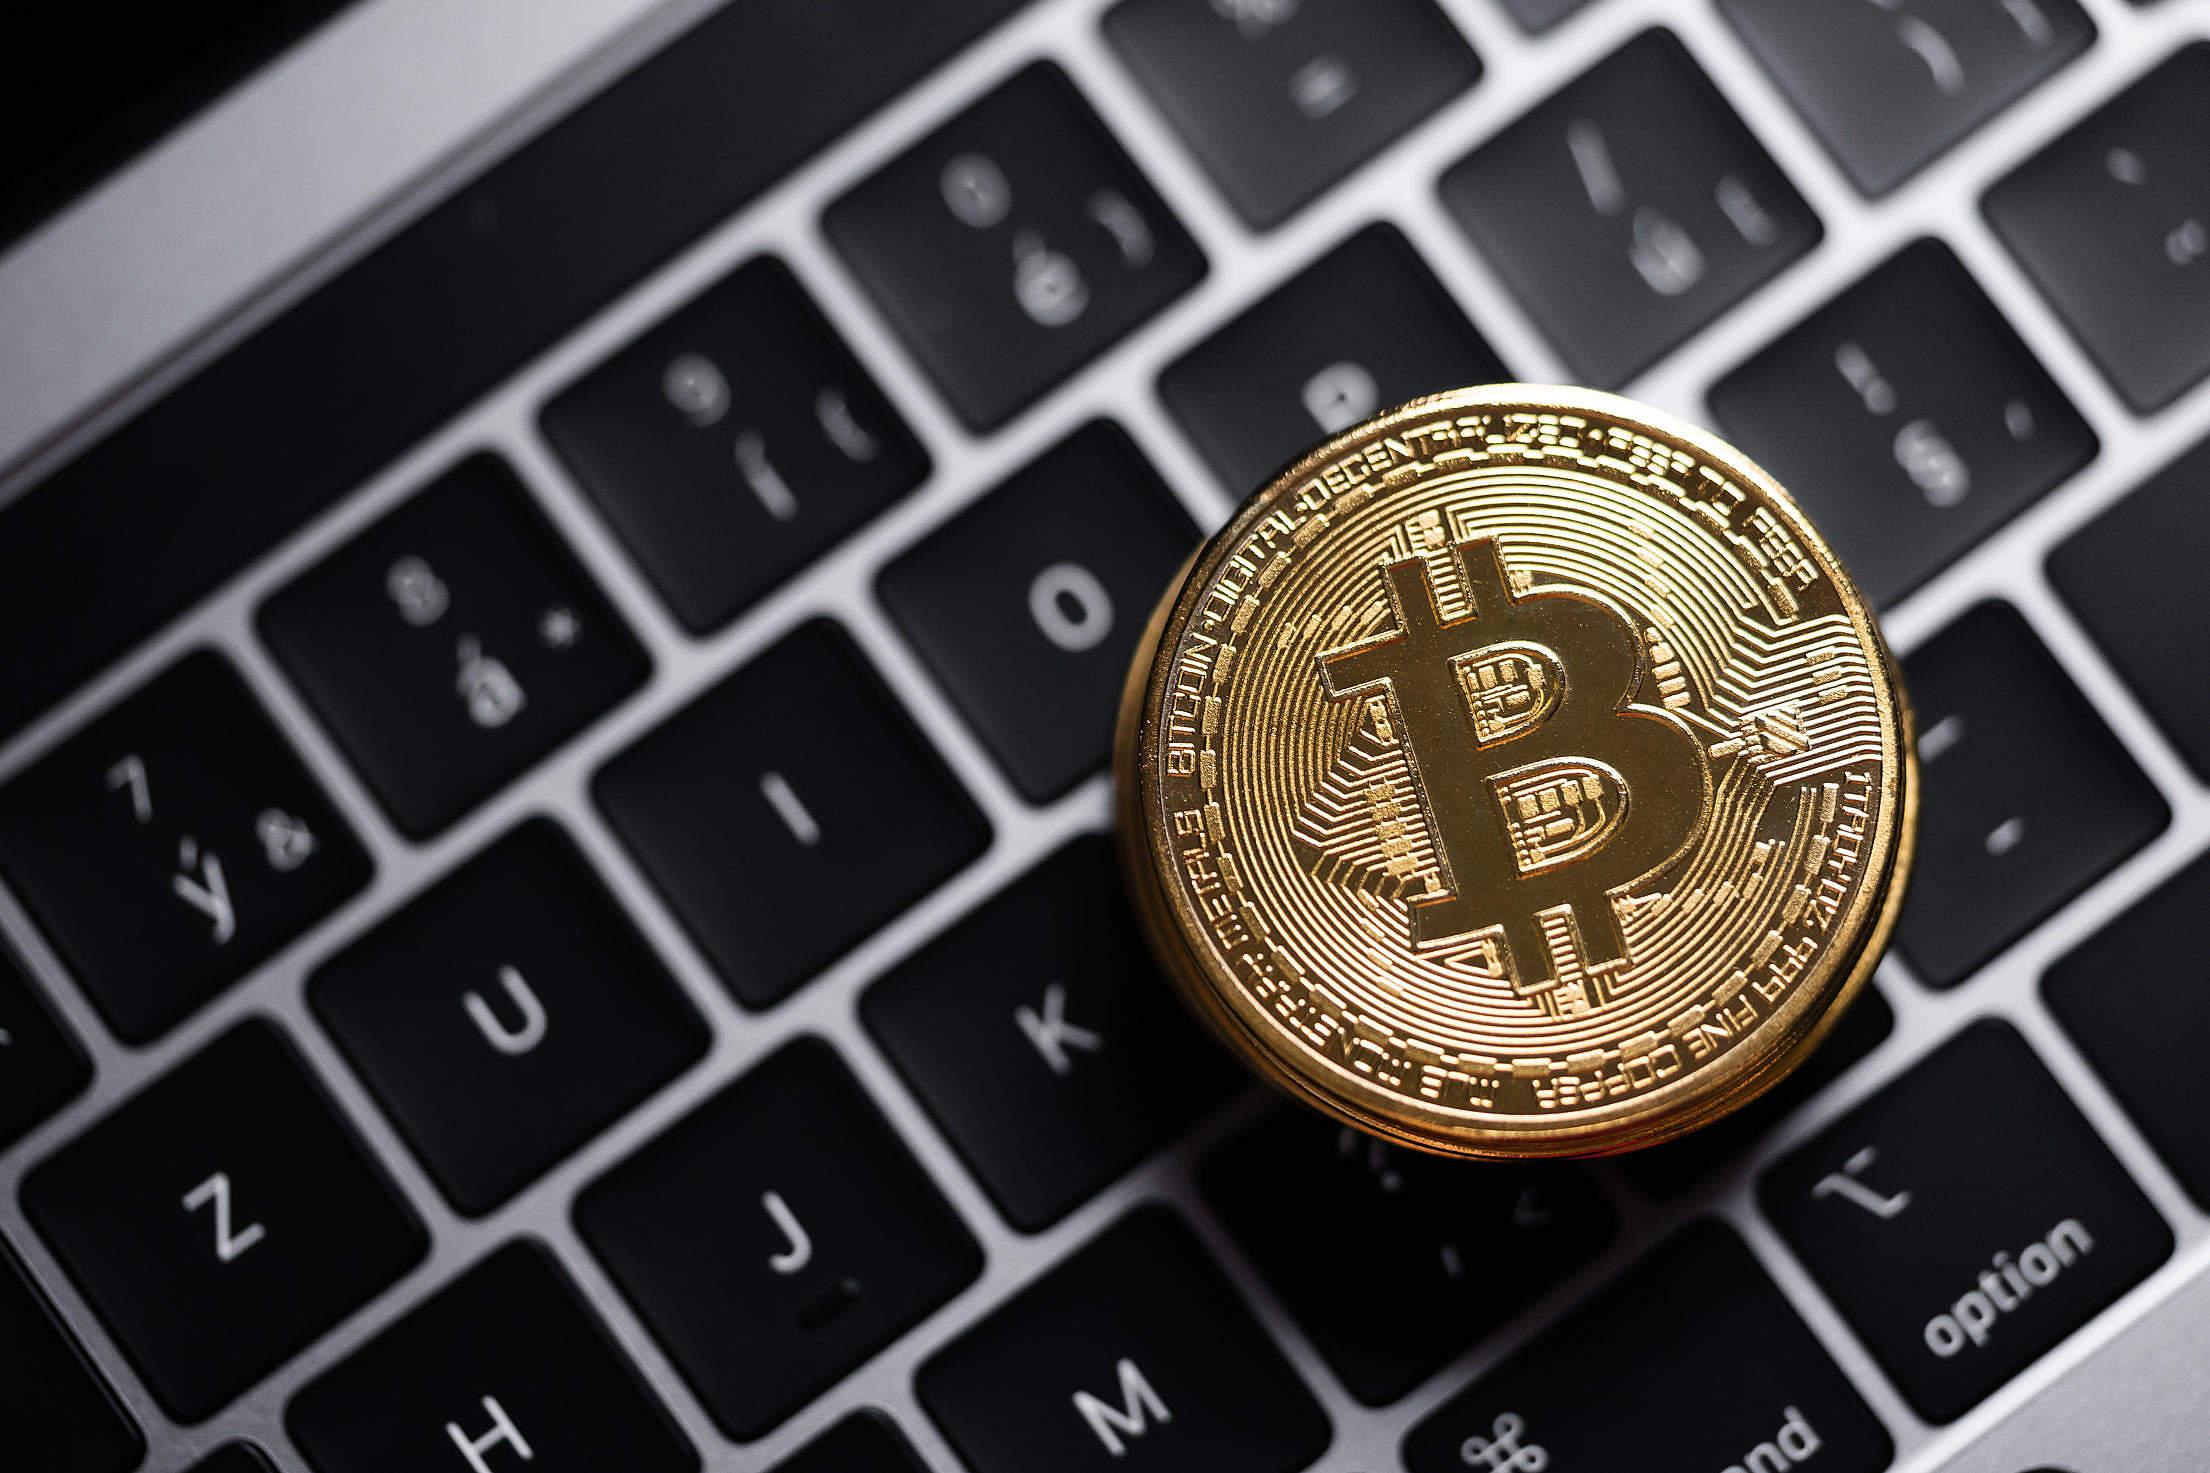 Golden Bitcoin on a MacBook Keyboard Free Stock Photo